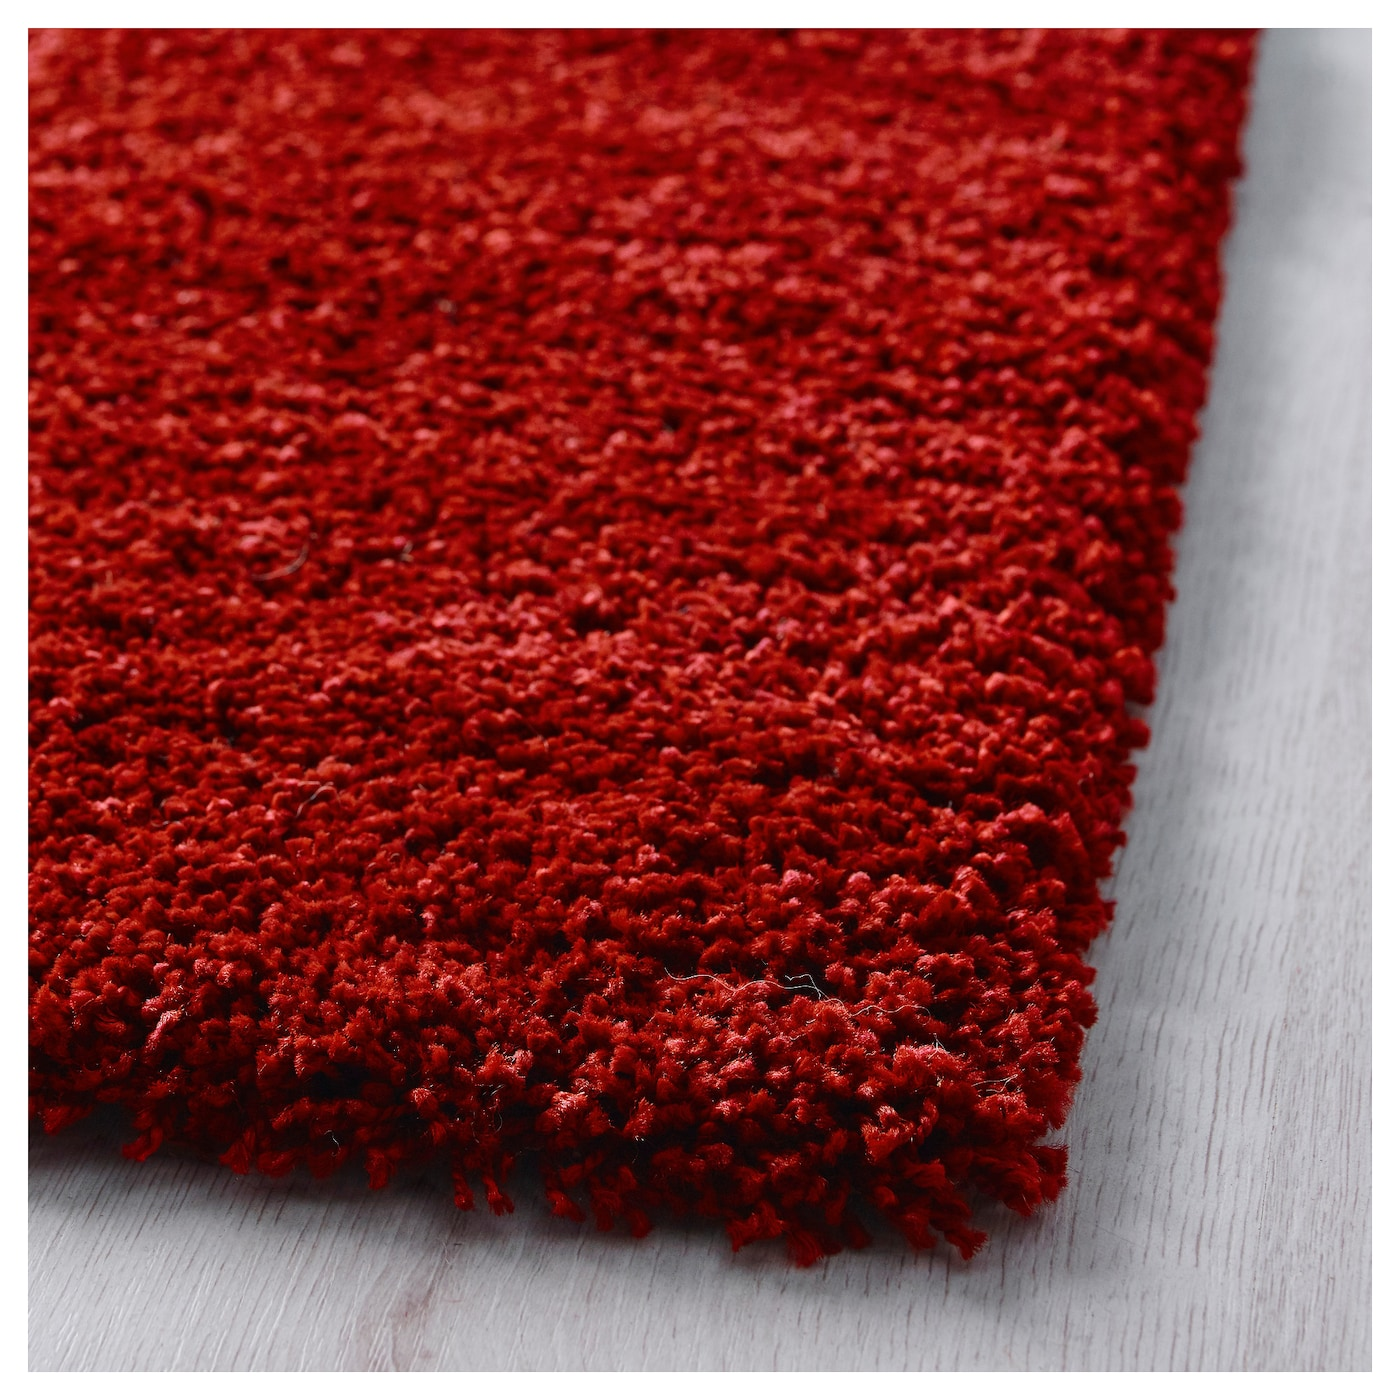 Dum rug high pile bright red 170x240 cm ikea - Ikea tappeti moderni ...